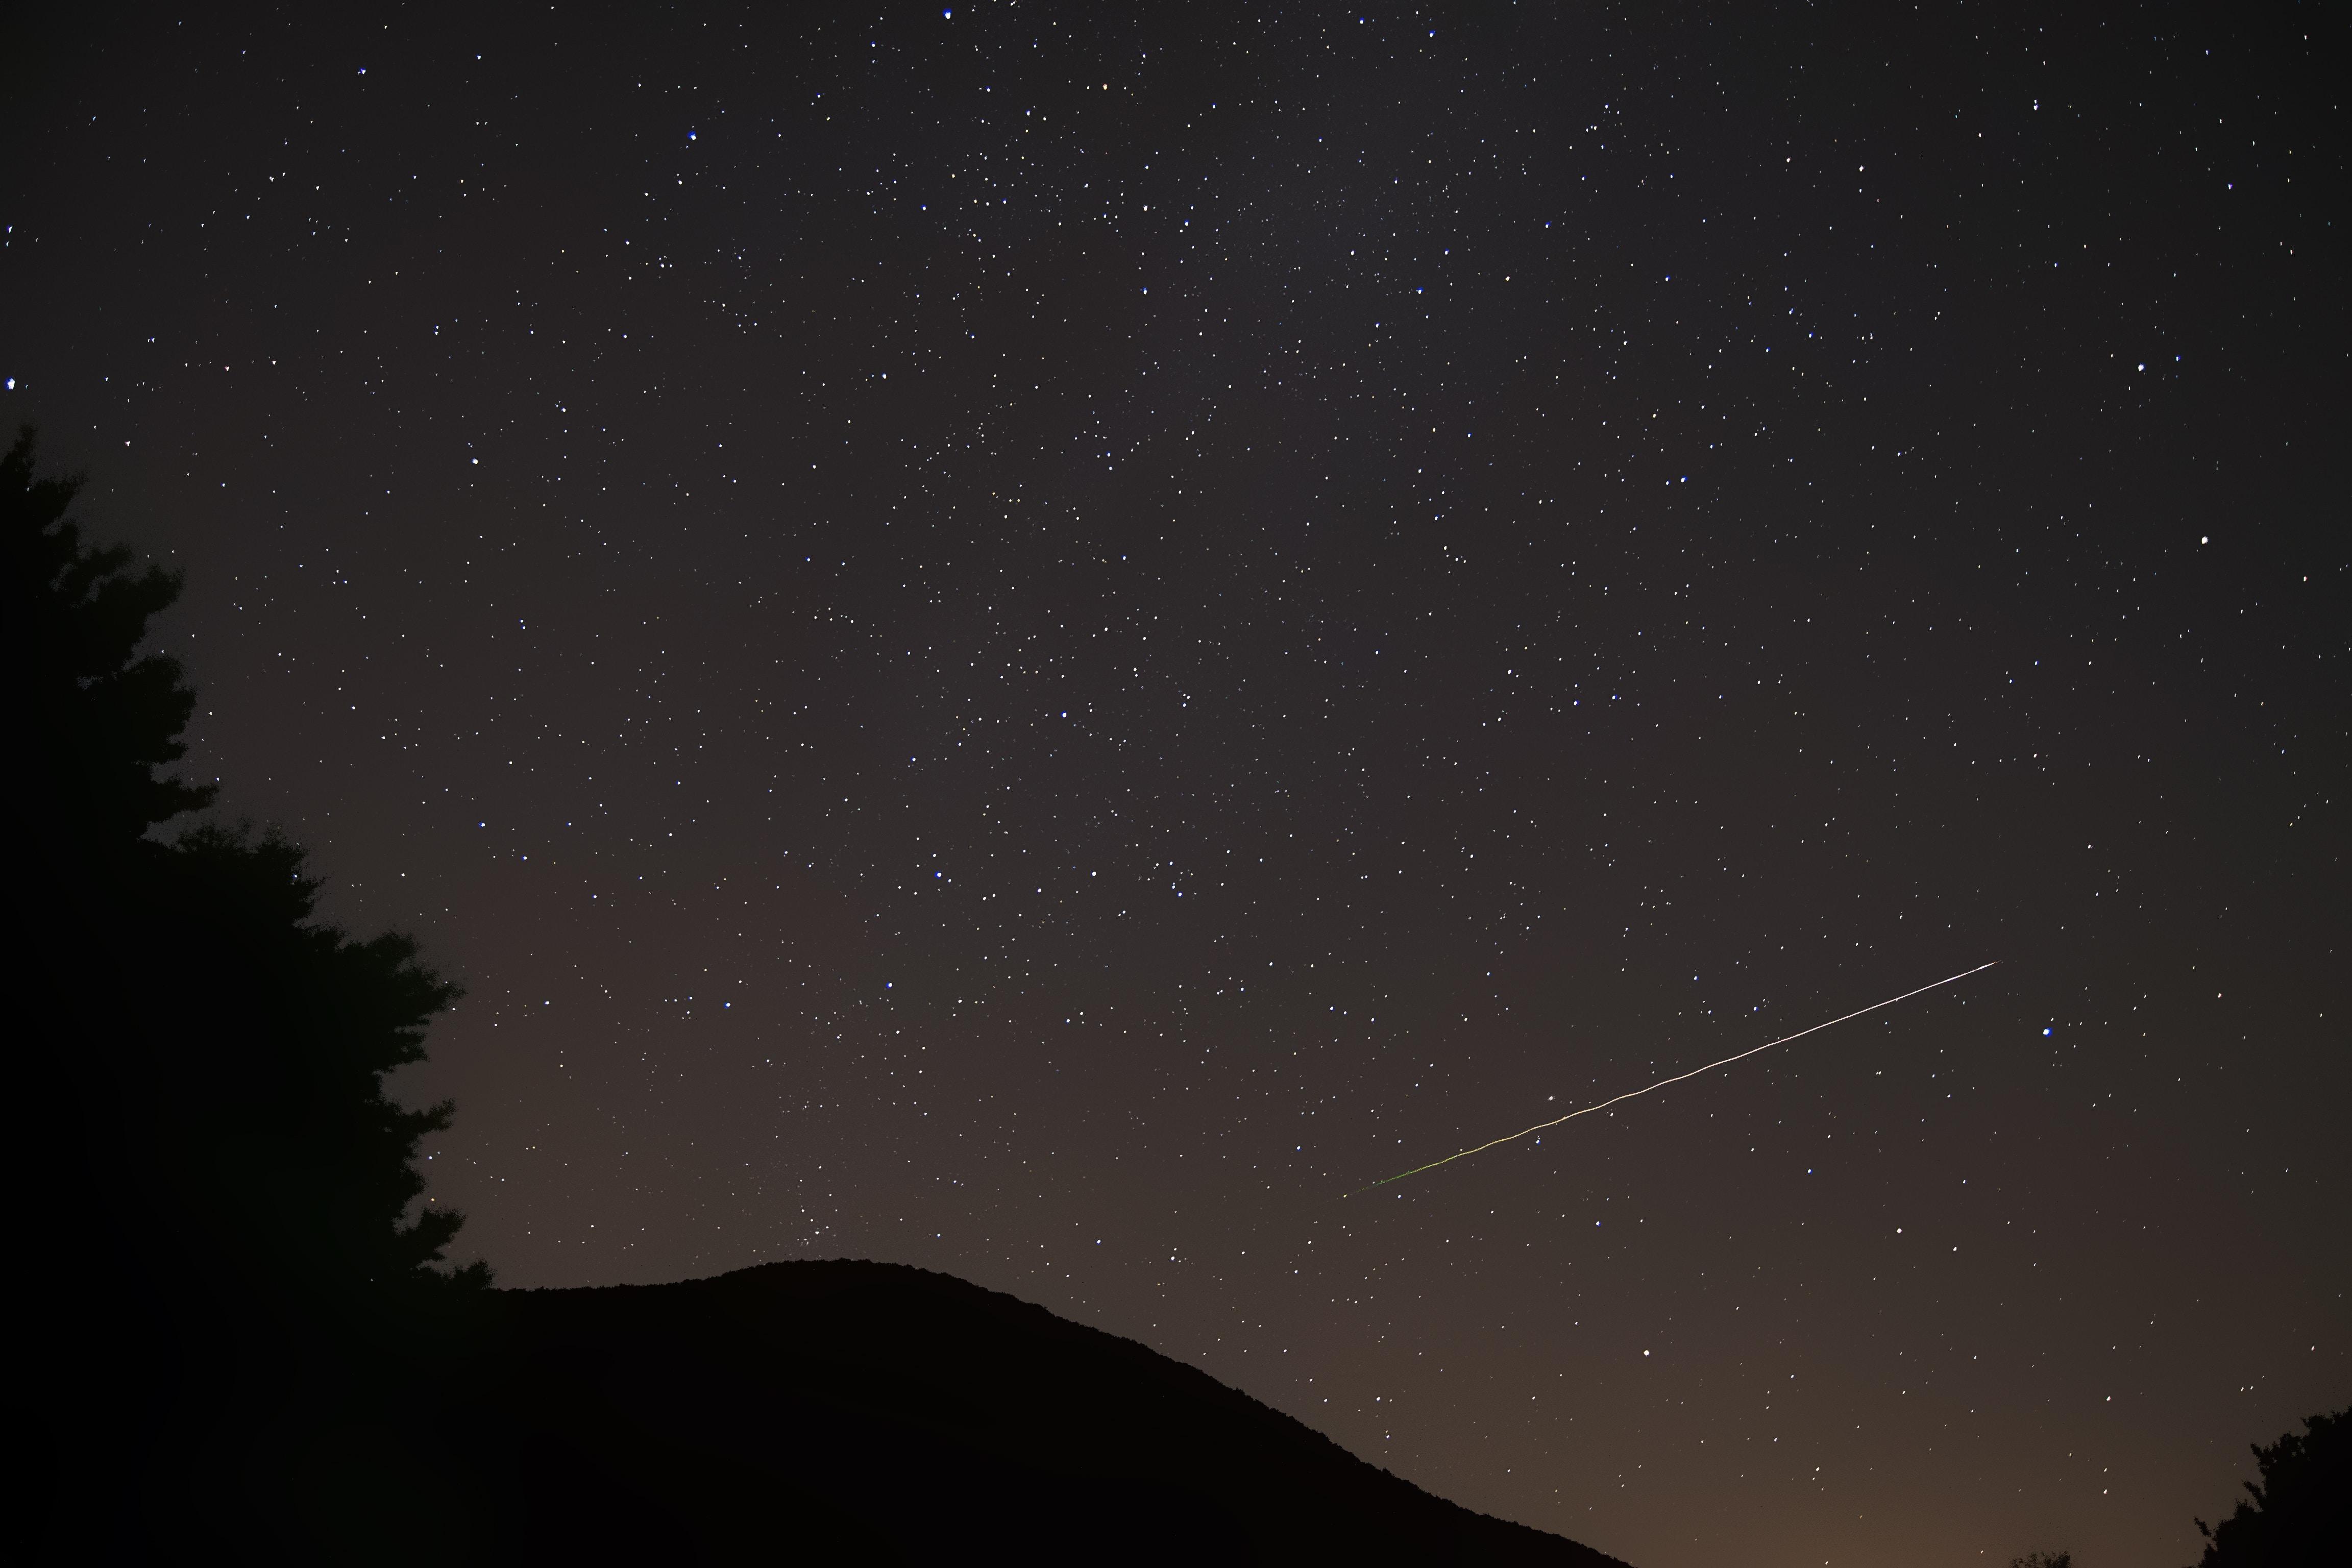 photographof falling star